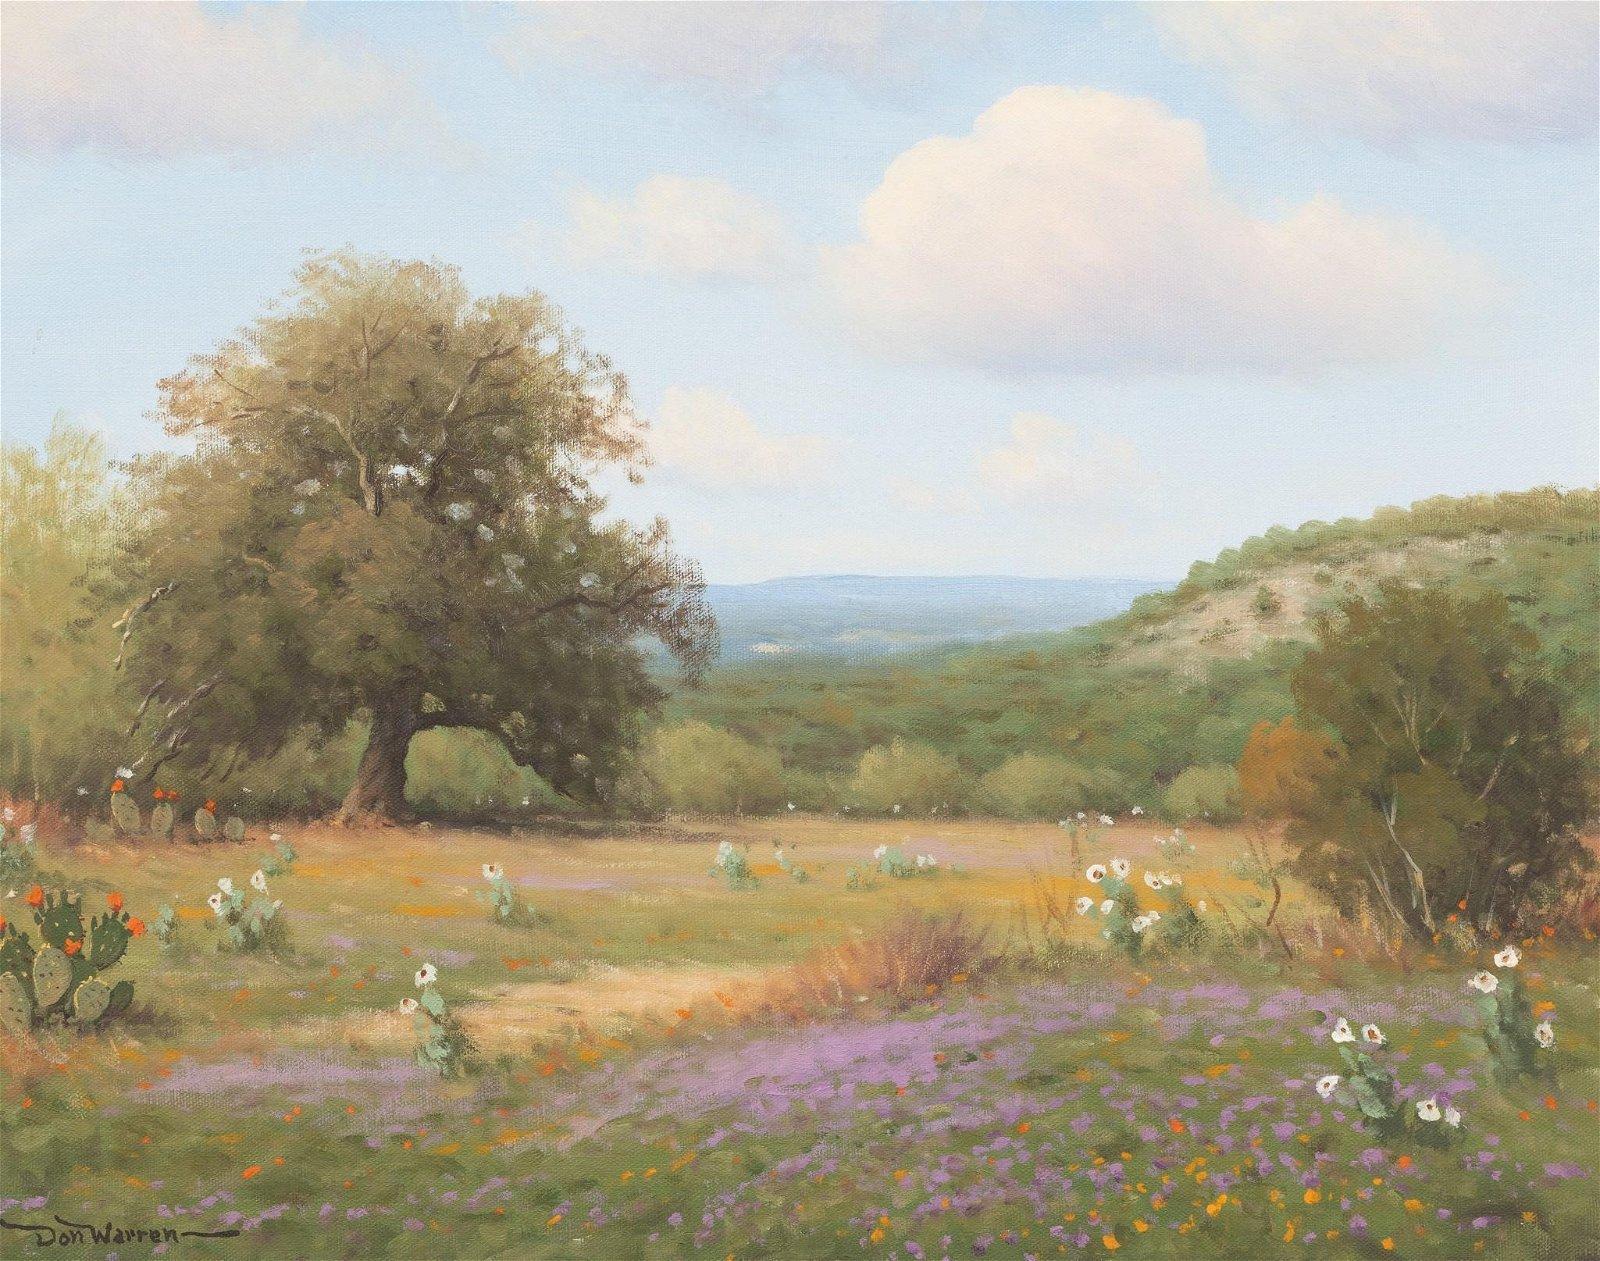 Don Warren (1935-2006), Verbena, oil on canvas, 16 x